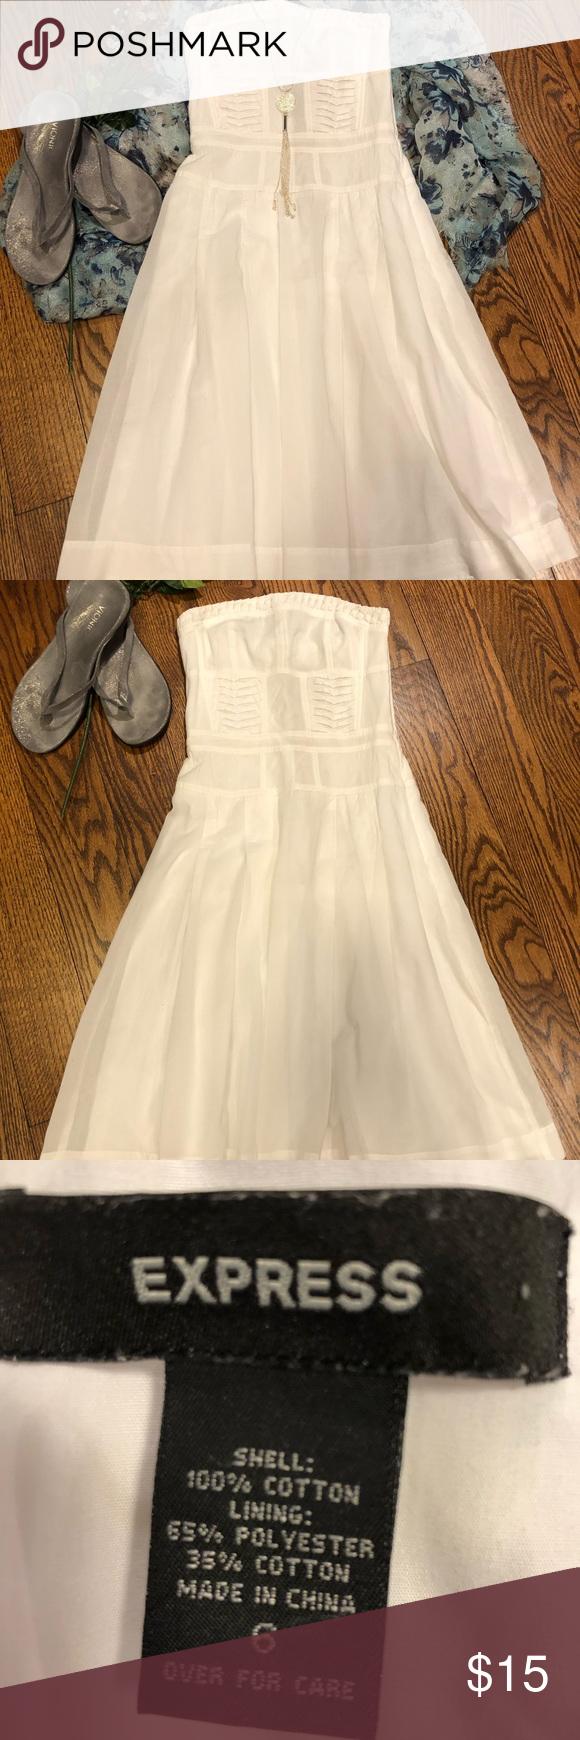 Express cotton strapless dress express white cotton strapless dress